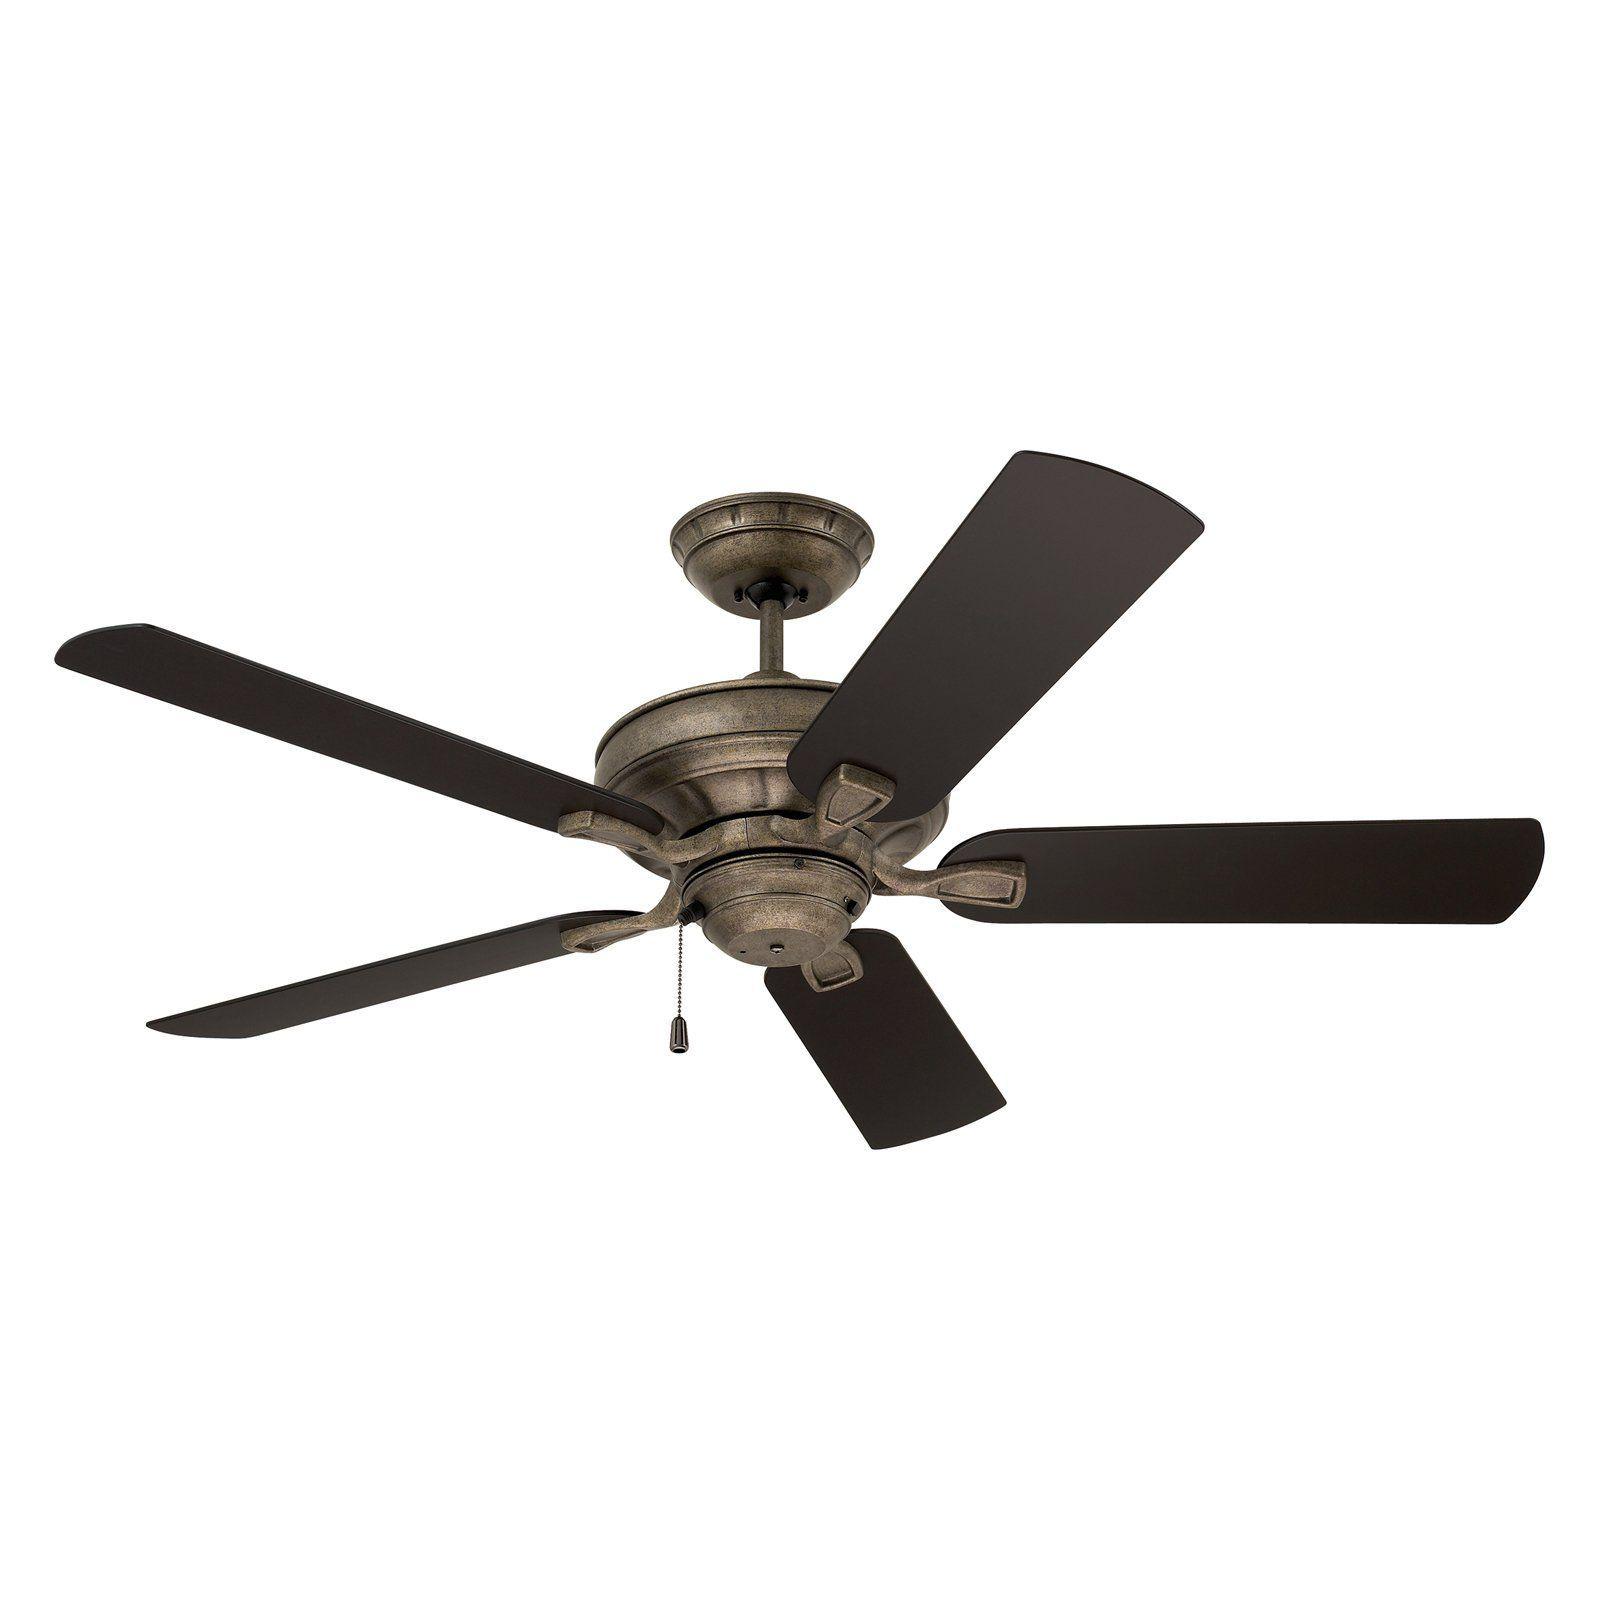 Emerson Cf552 Veranda 52 In Outdoor Ceiling Fan Cf552aw Outdoor Ceiling Fans Ceiling Fan Emerson Fan